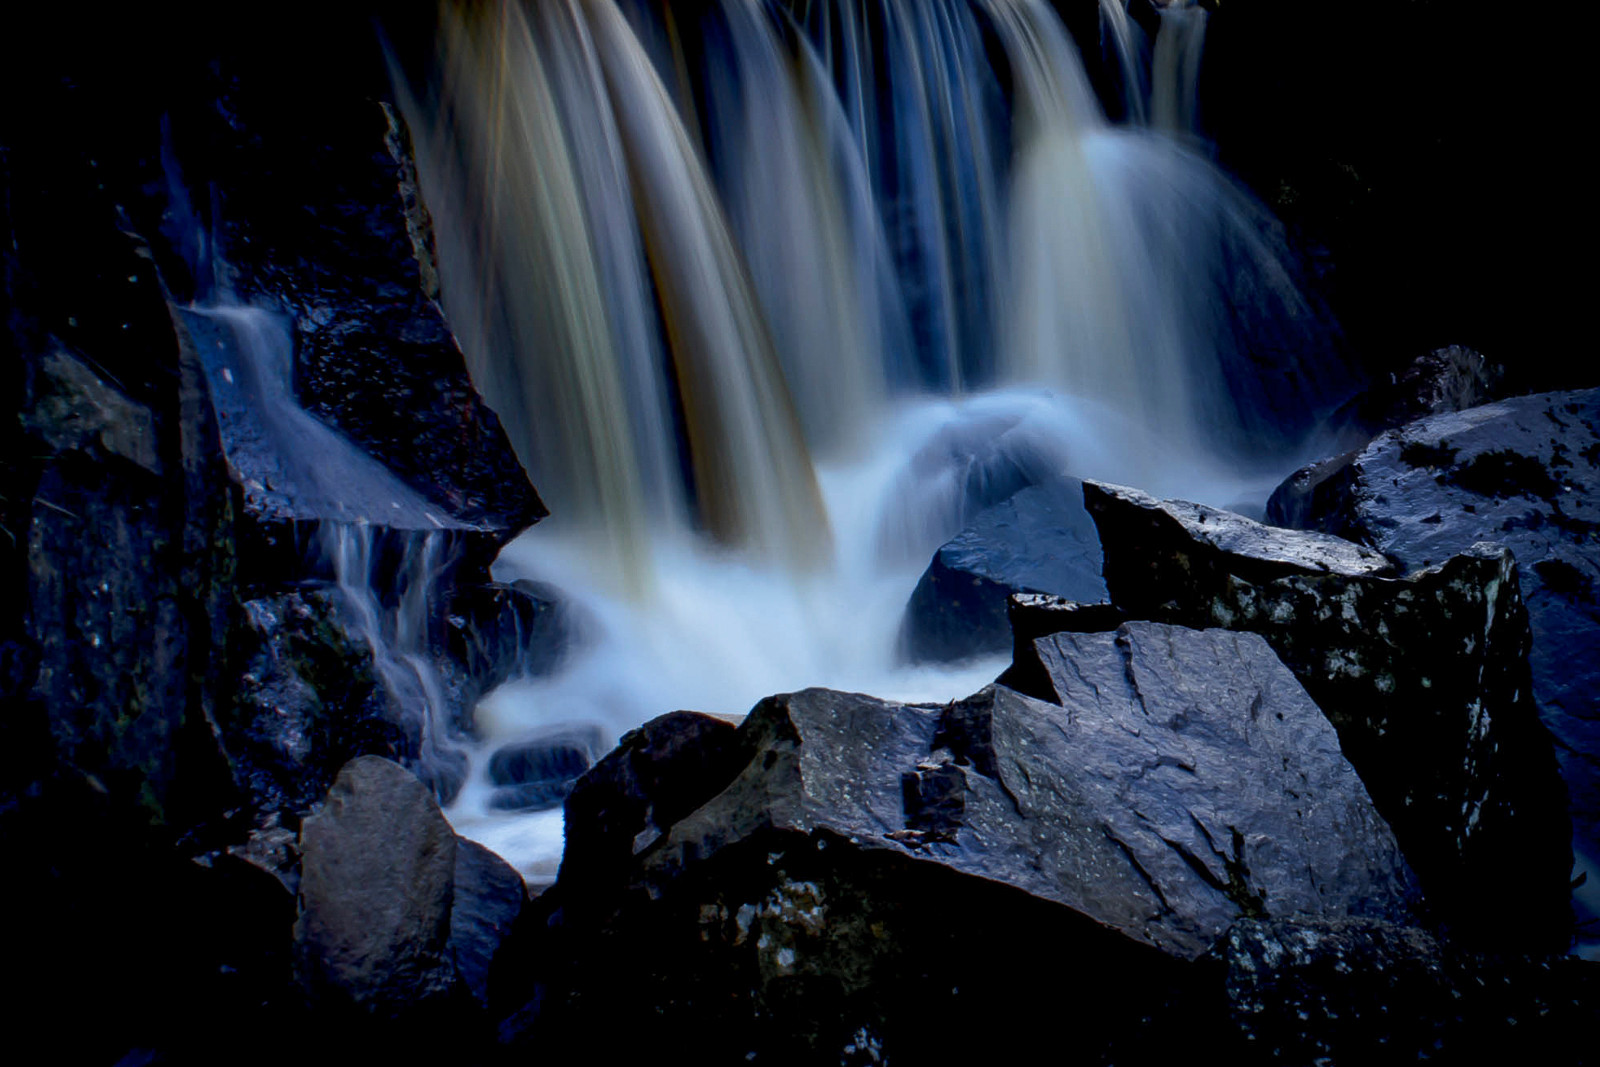 PDI - Dark Waters by Wendy McDaniel (10 marks)